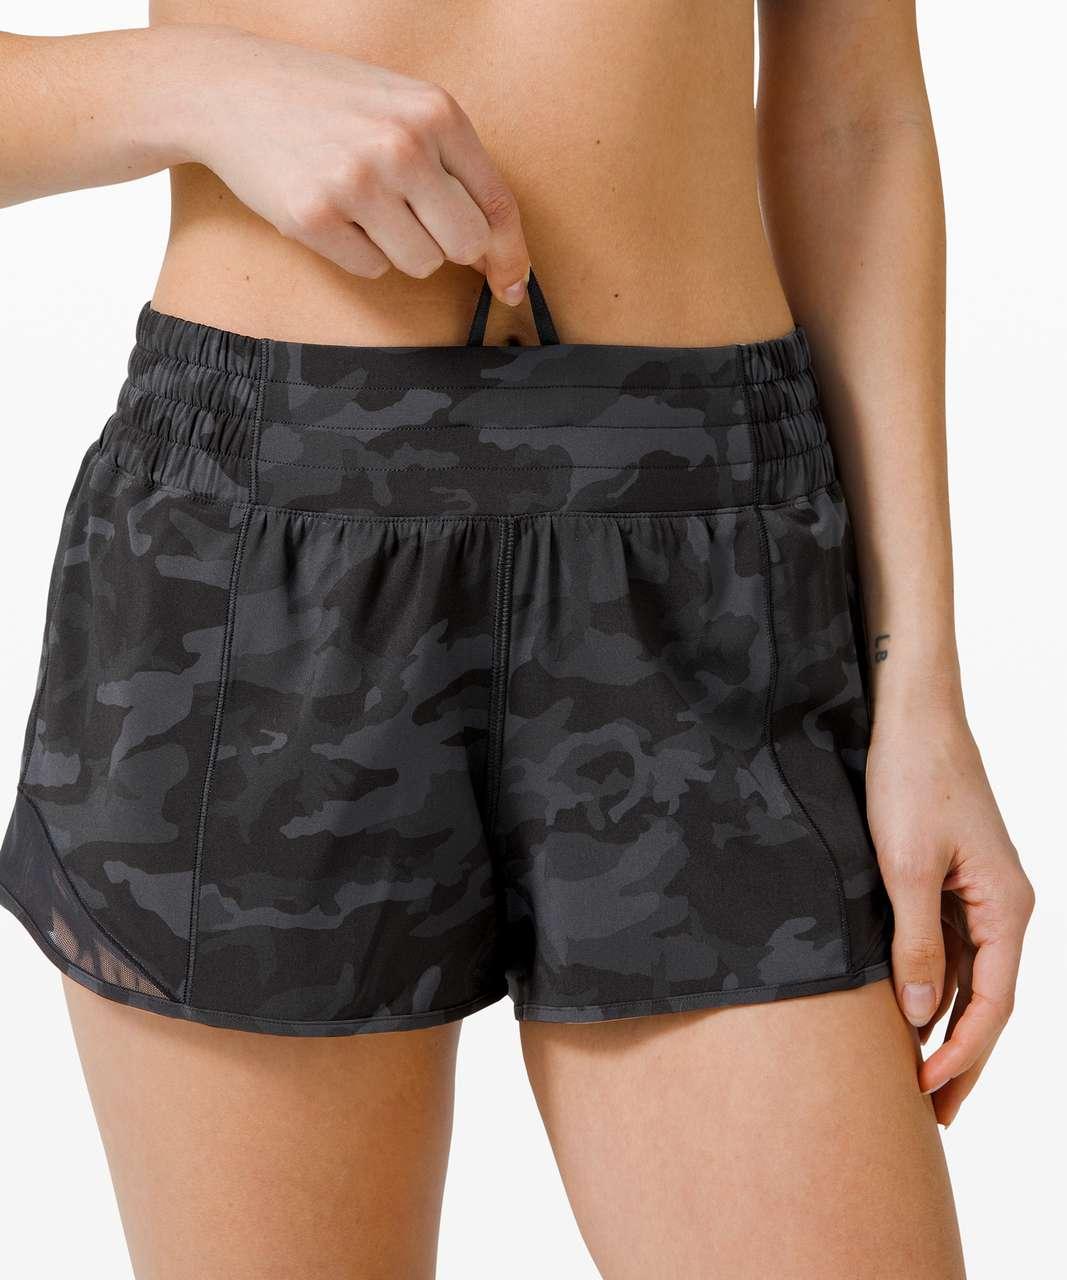 "Lululemon Hotty Hot Short *High-Rise 2.5"" - Incognito Camo Multi Grey / Black"